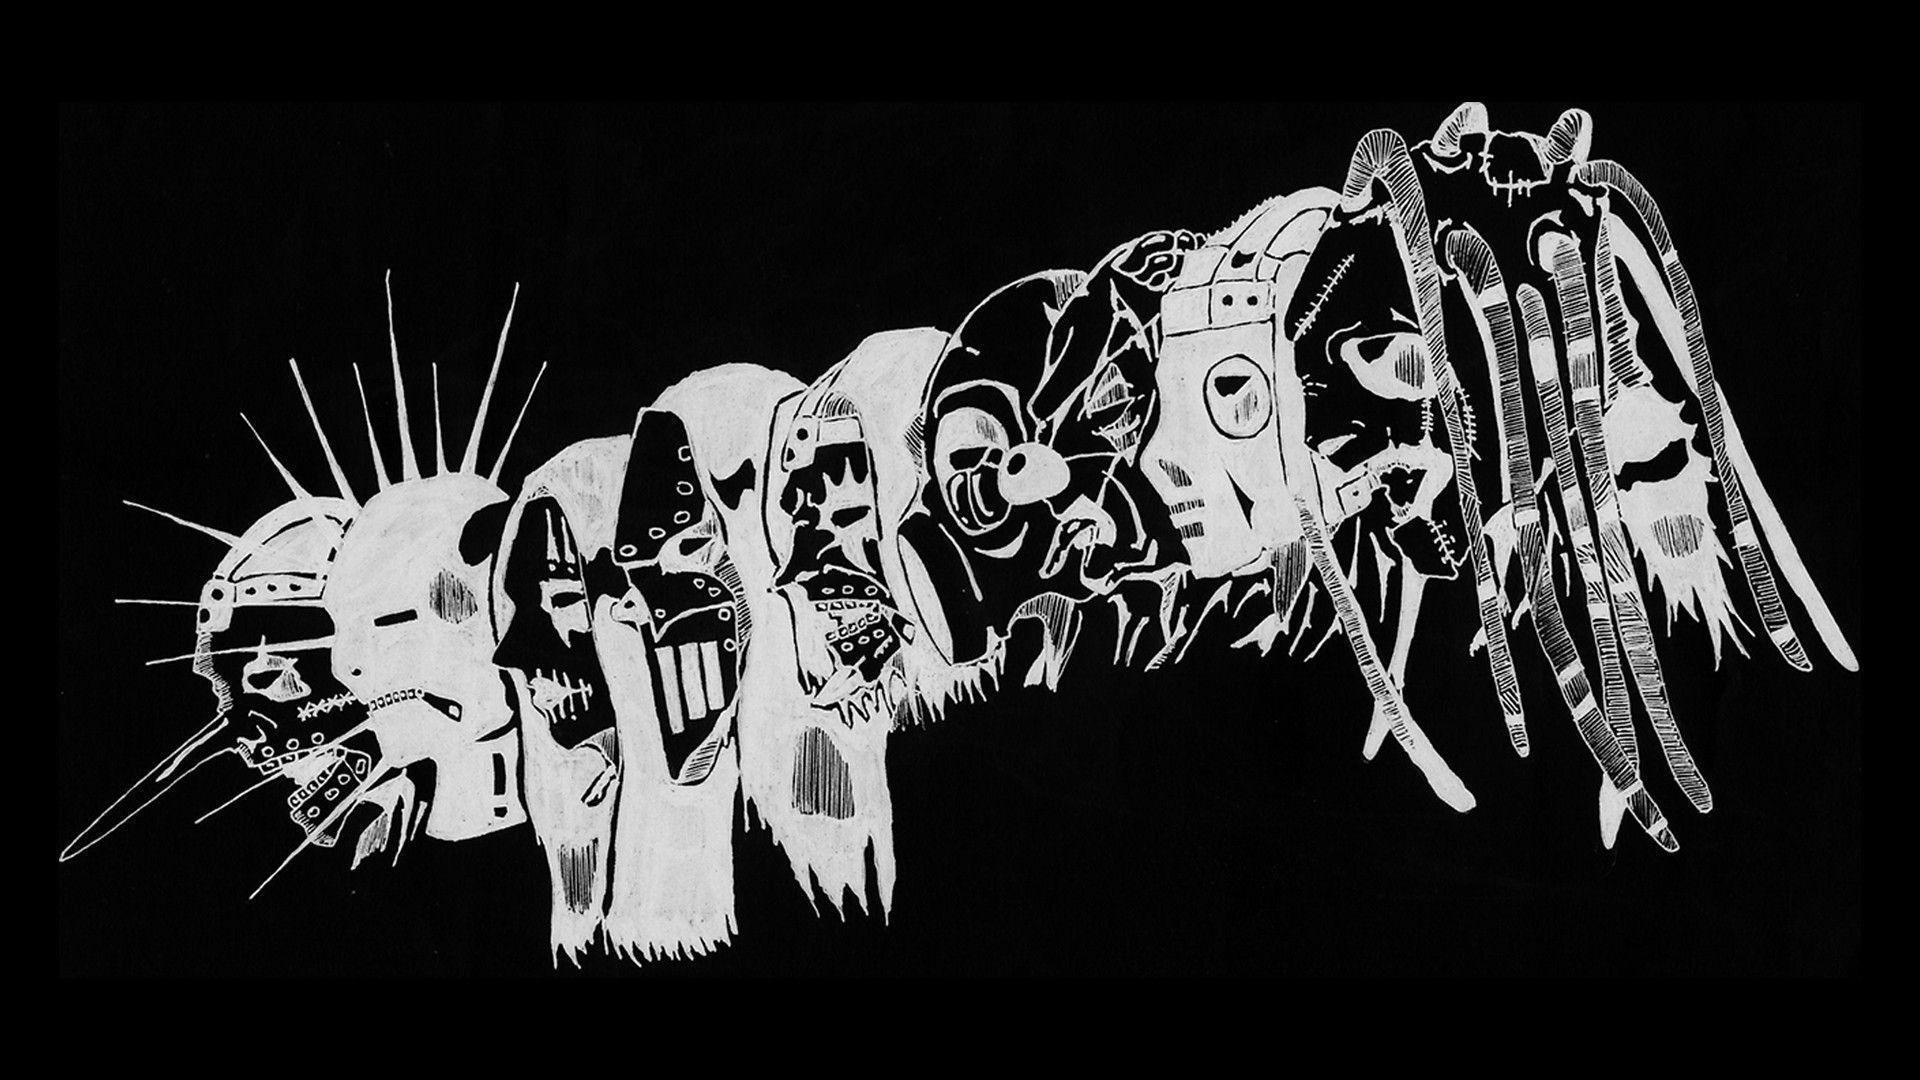 metal, metal music, Slipknot 2